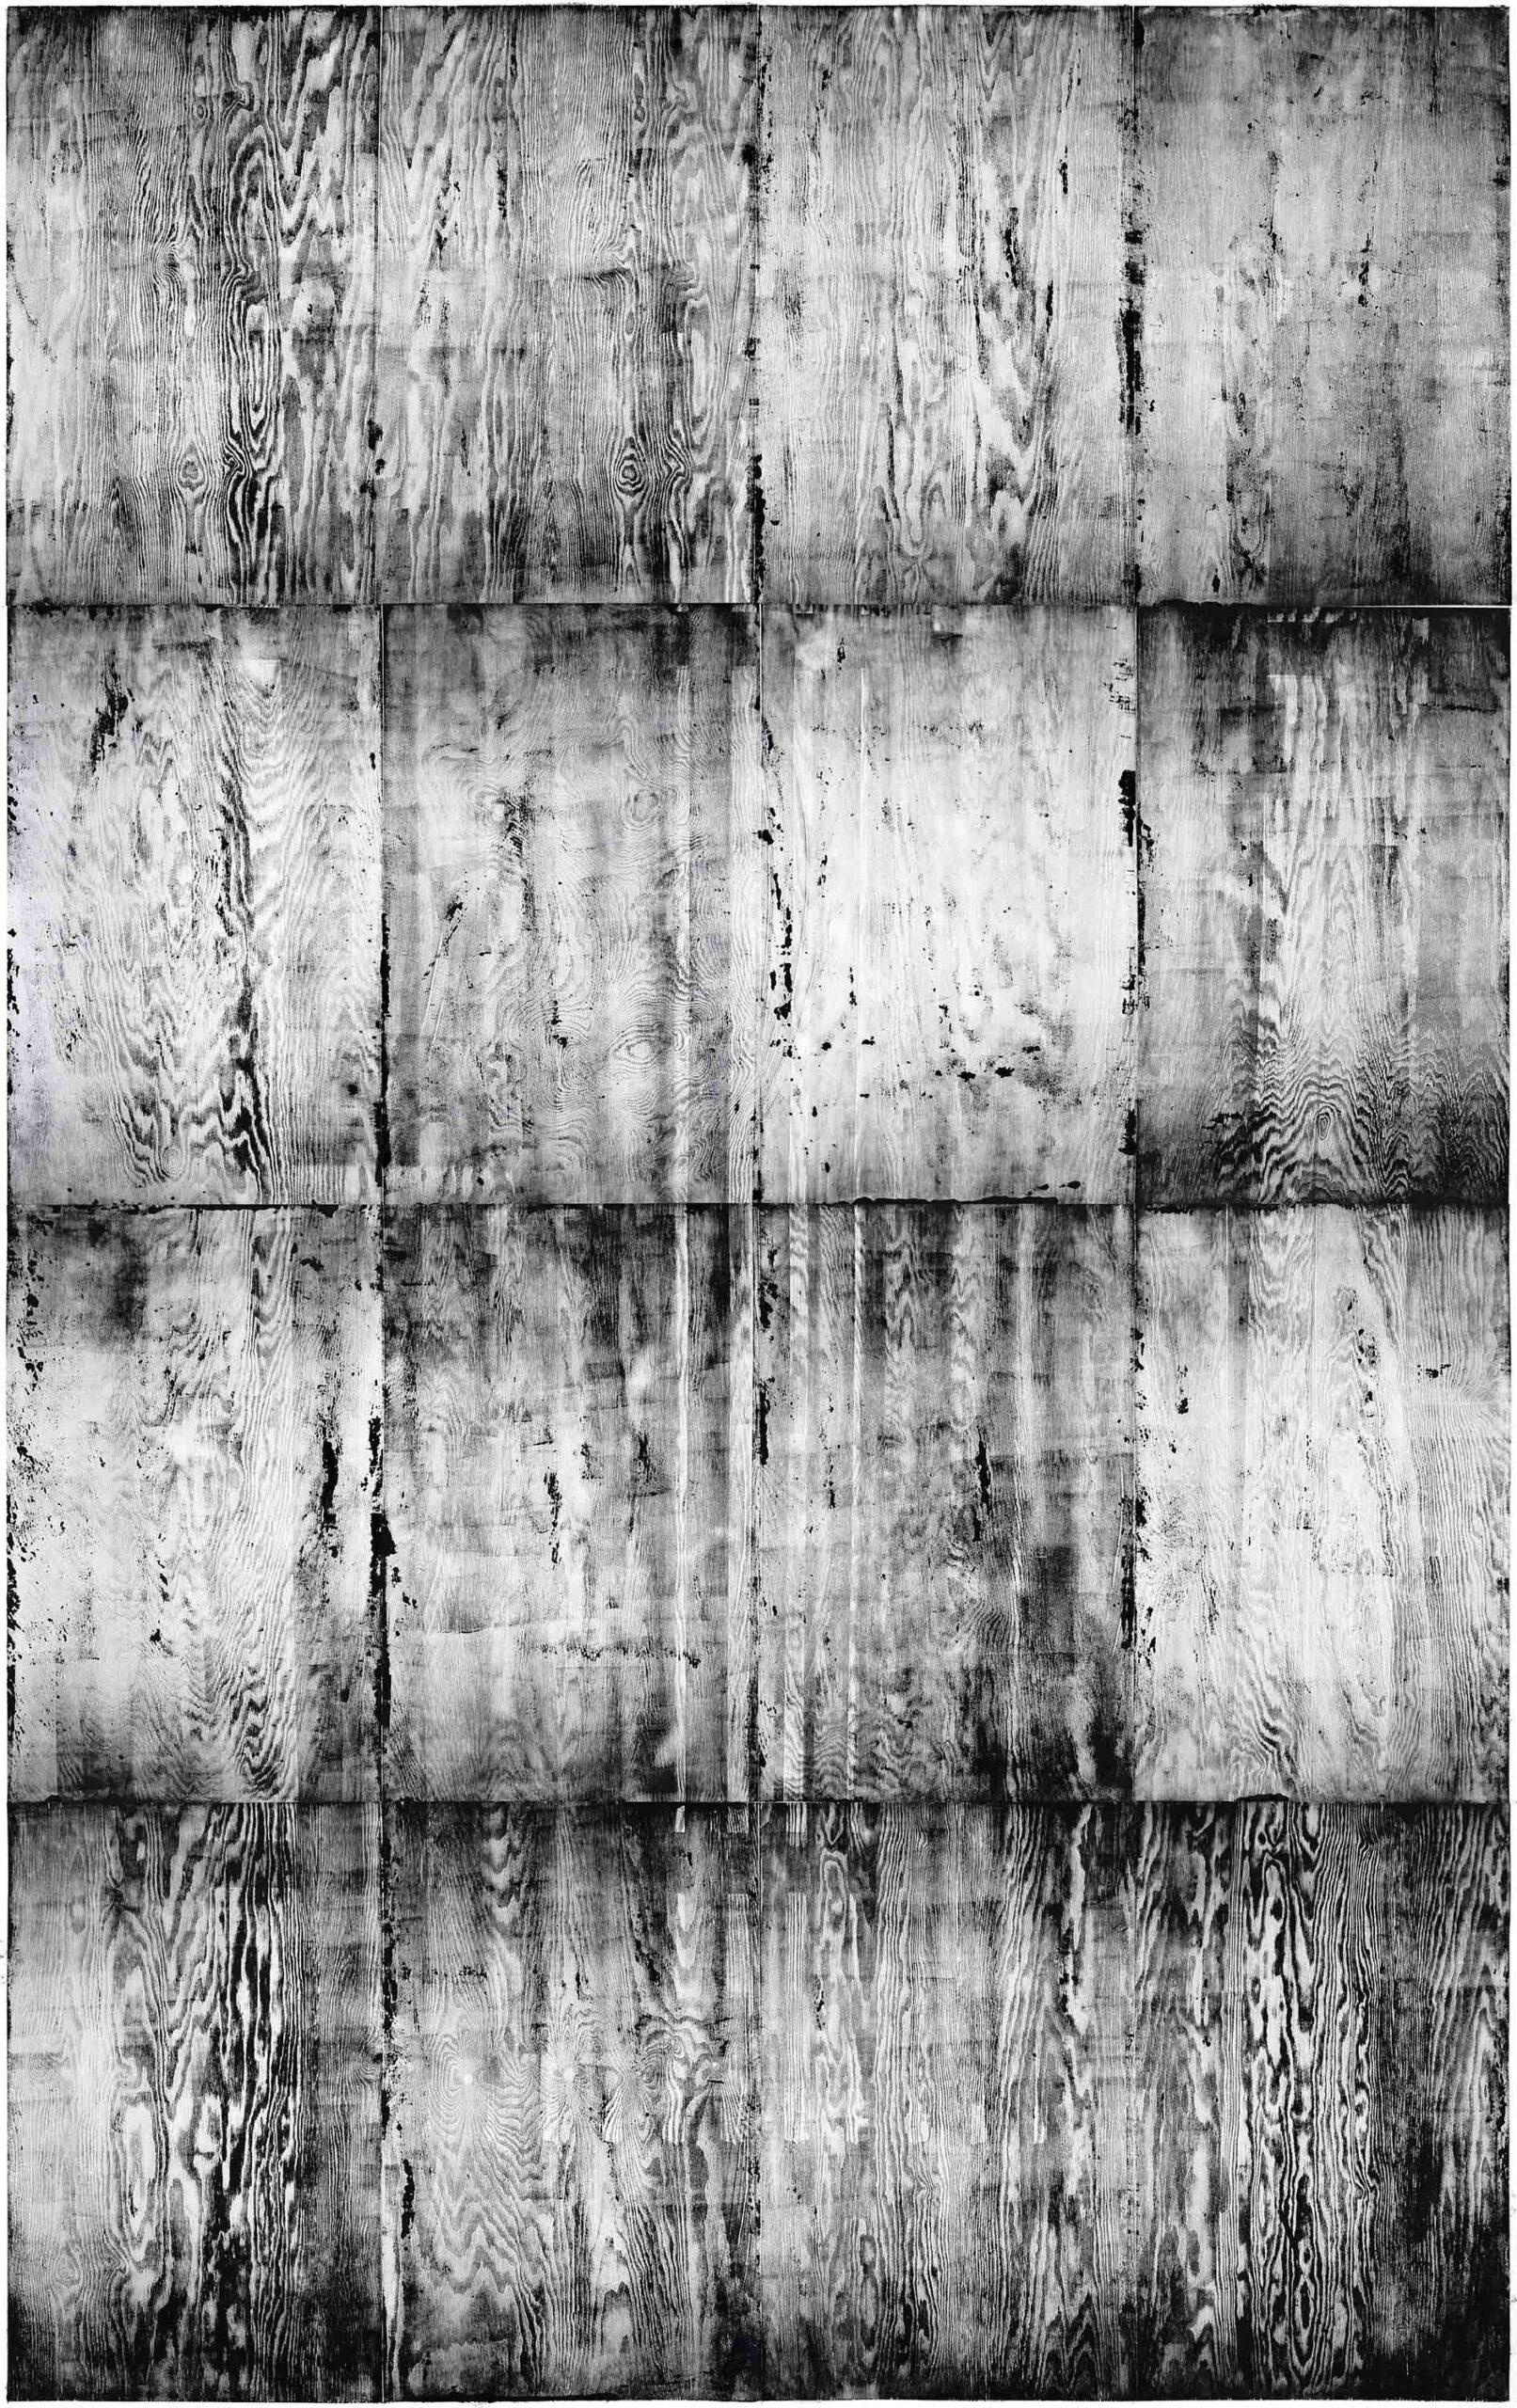 Heating 1, 2020, wood engraving, 402,5 x 260 cm, Genaro Strobel